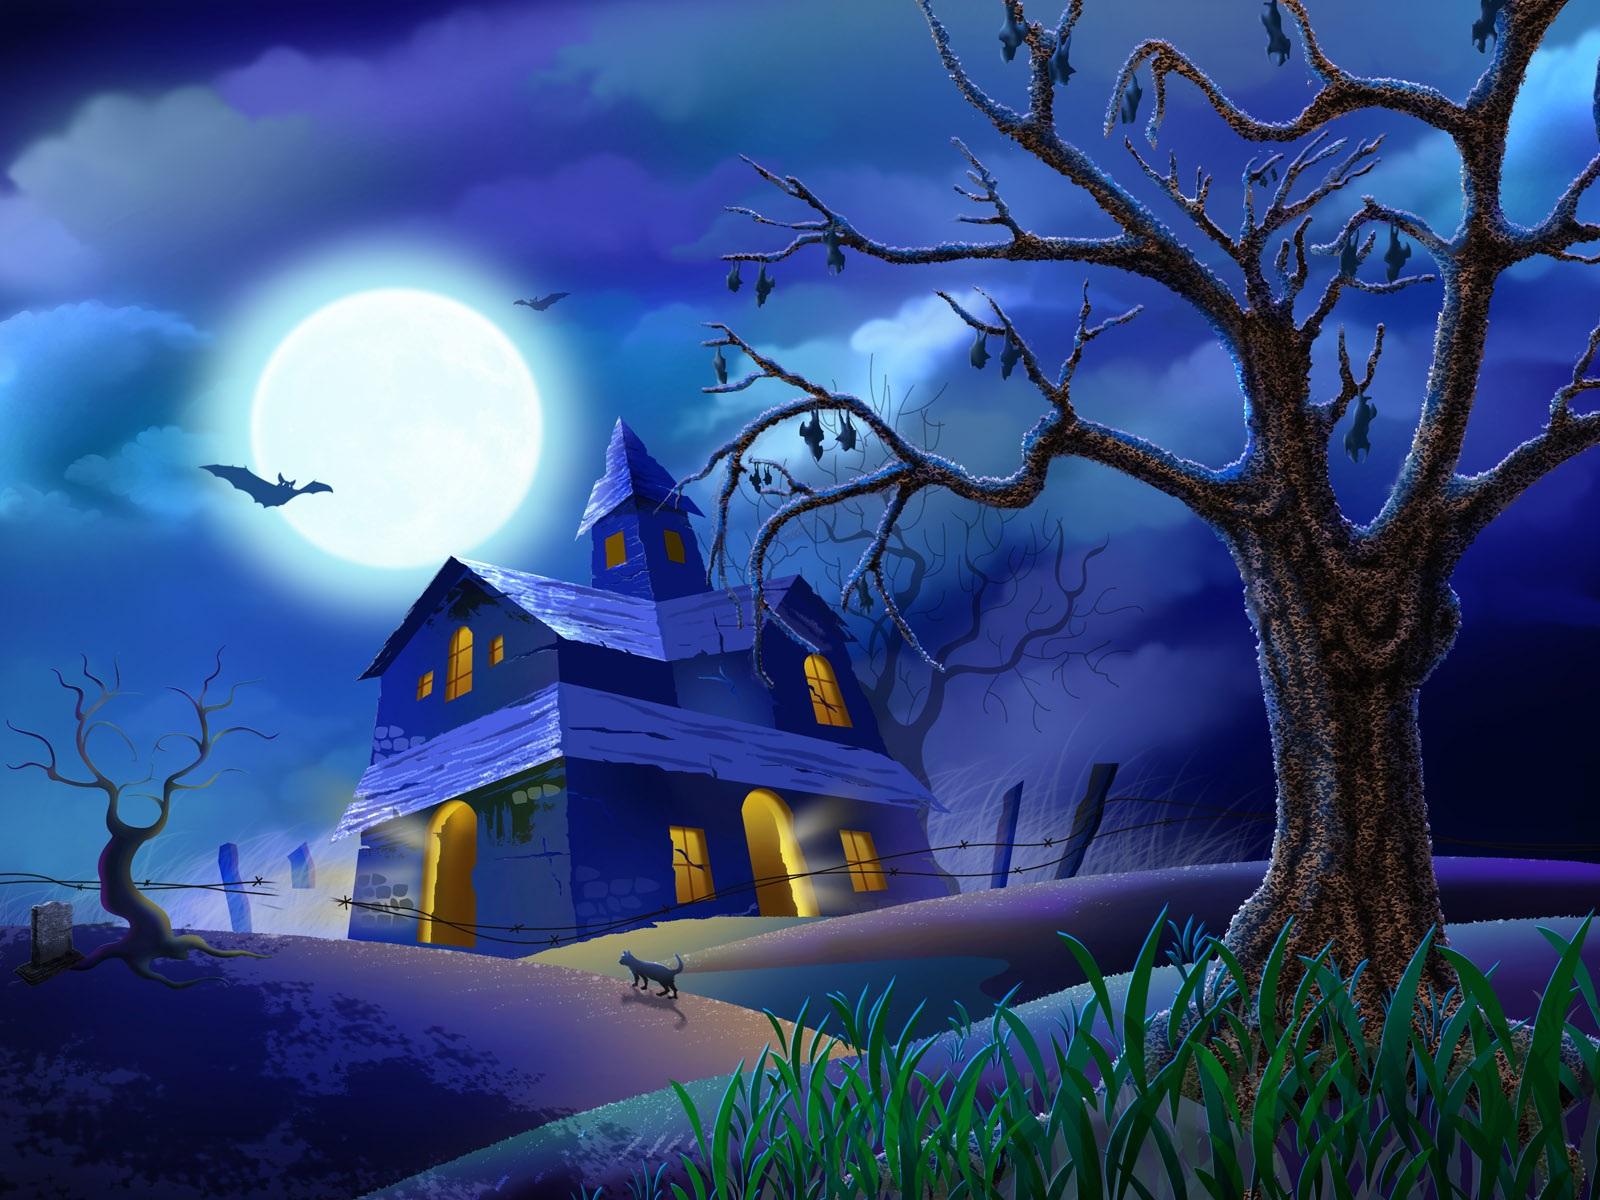 the night of halloween 13 nights of halloween wasn't enough so we've got 31 nights of halloween 5:30pm/4:30c disney•pixar's monsters university freeform premiere 8pm/7c decorating disney: halloween magic.